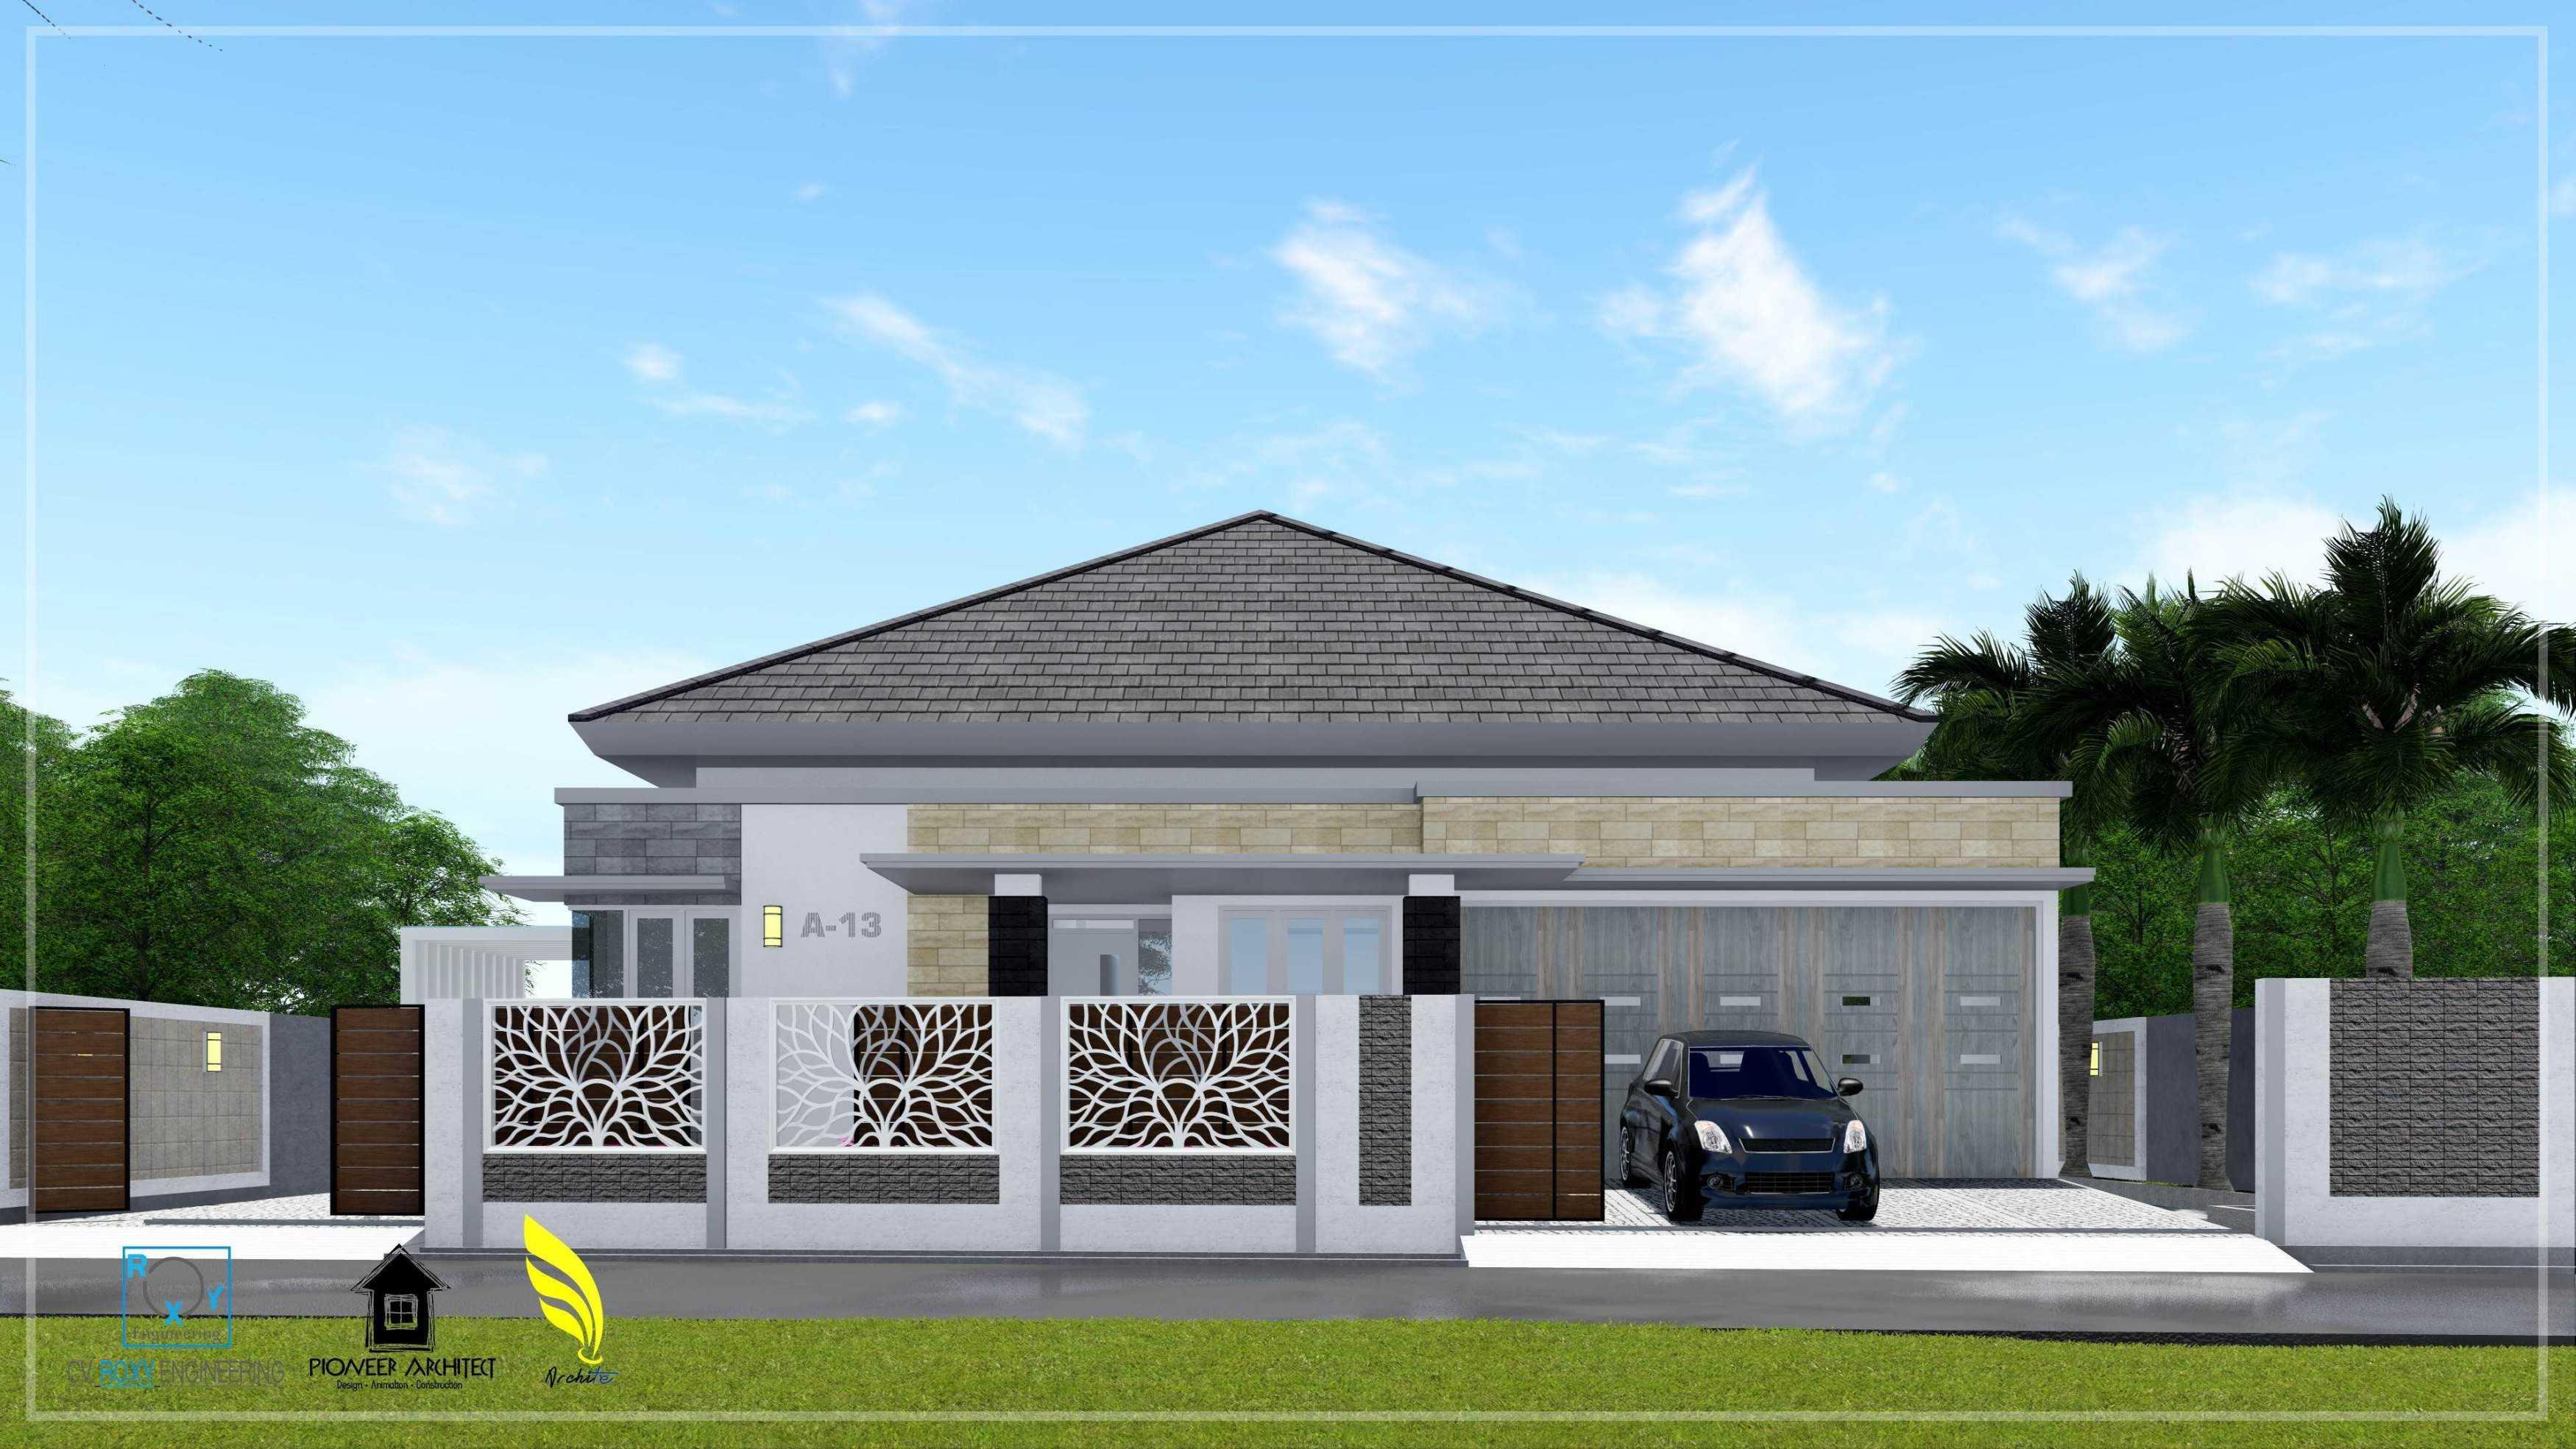 Pionner Architect Dd House Banda Aceh, Kota Banda Aceh, Aceh, Indonesia Banda Aceh, Kota Banda Aceh, Aceh, Indonesia Tampak Depan Modern  43291